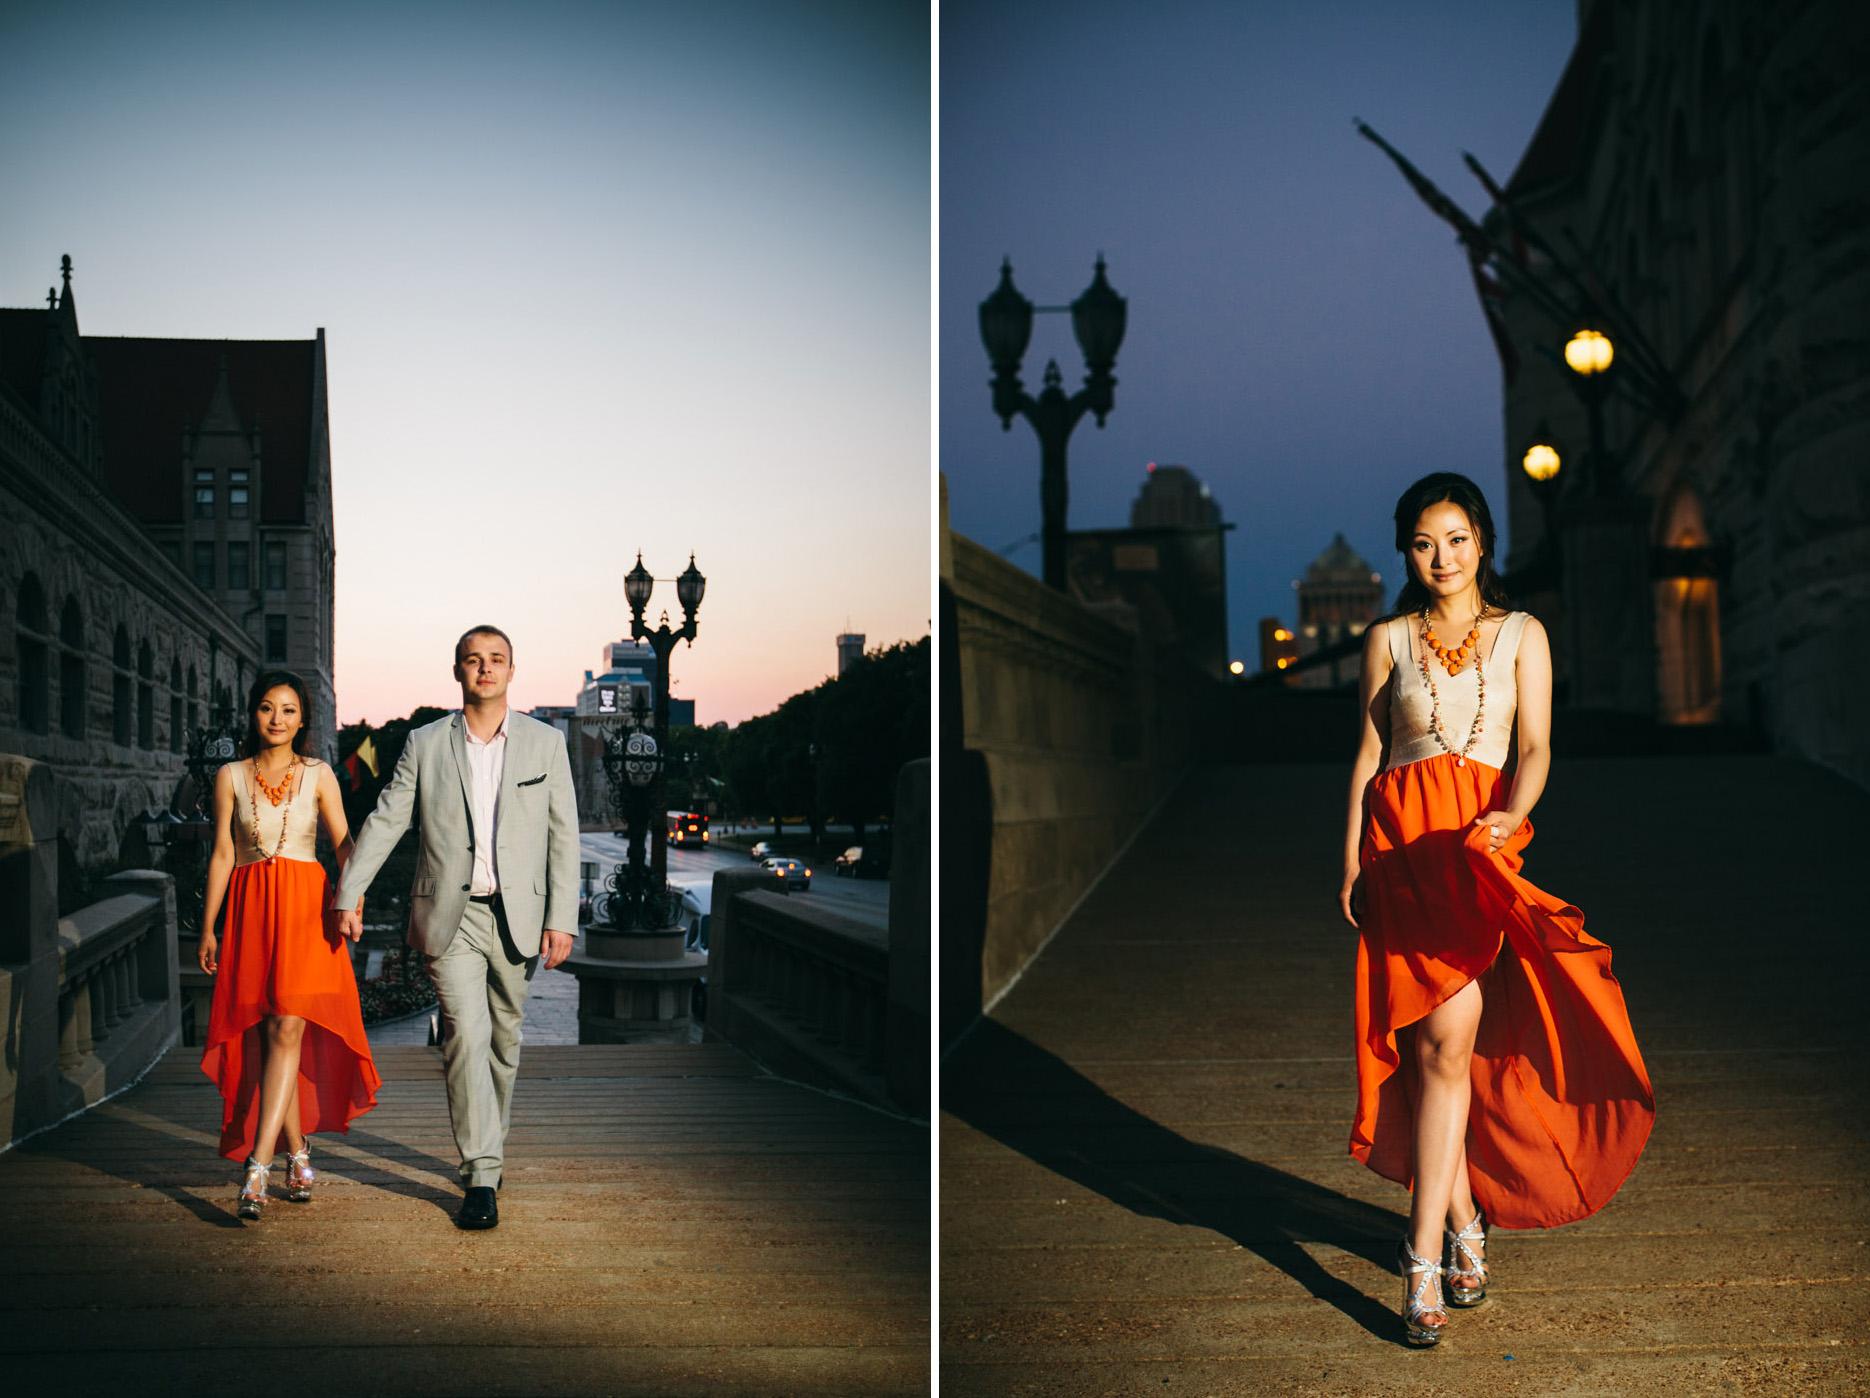 St-Louis-Wedding-Photography-1018-copy.jpg